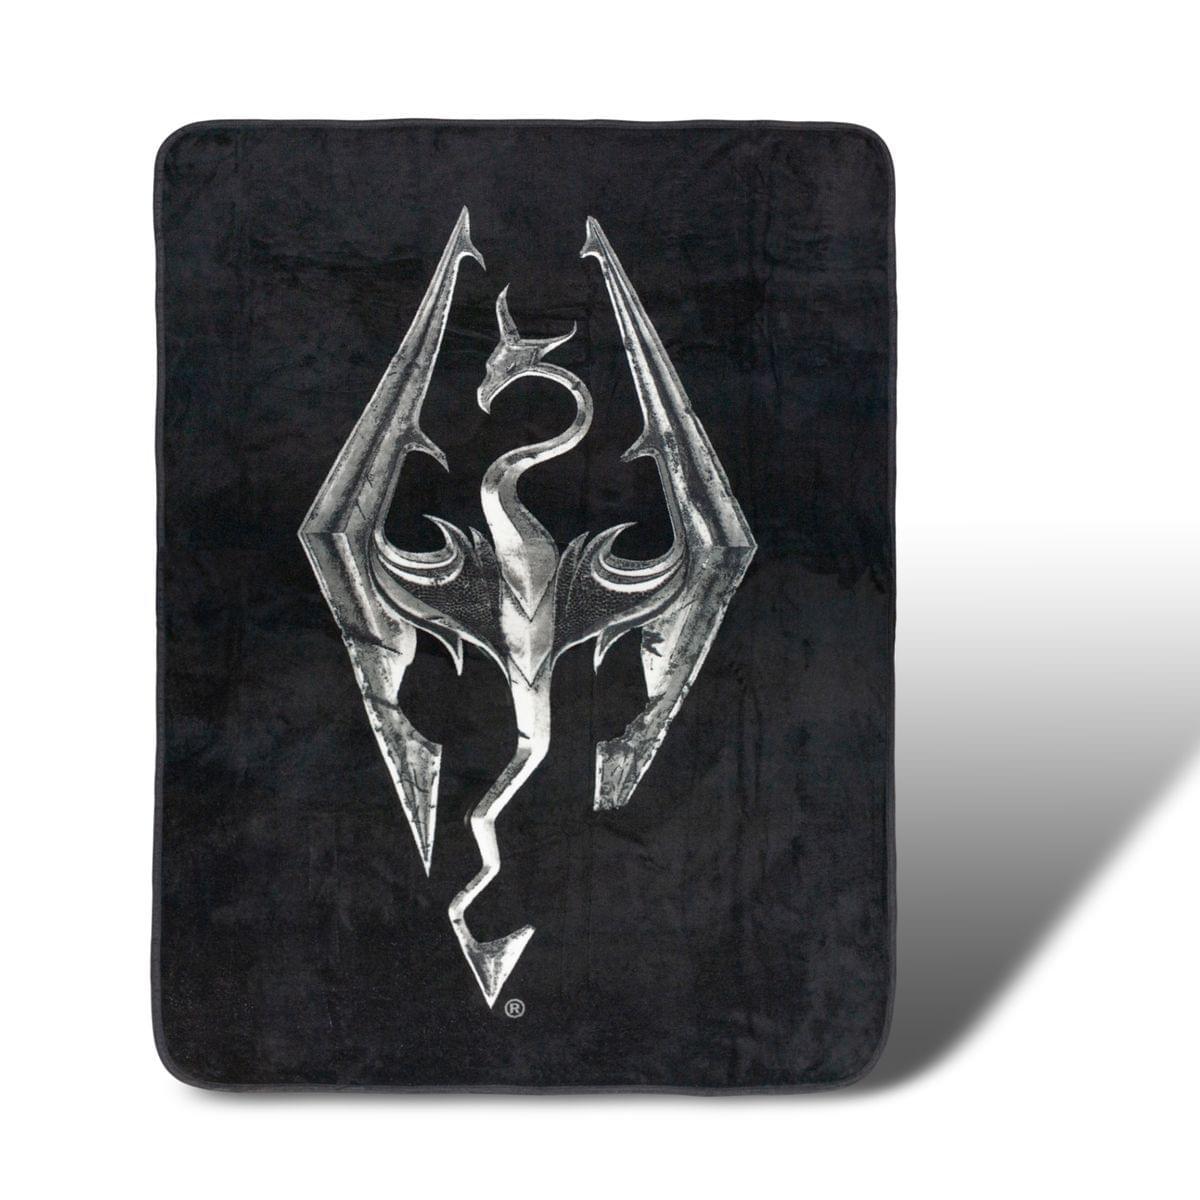 Skyrim Dragon Emblem Lightweight Fleece Throw Blanket | 45 x 60 Inches